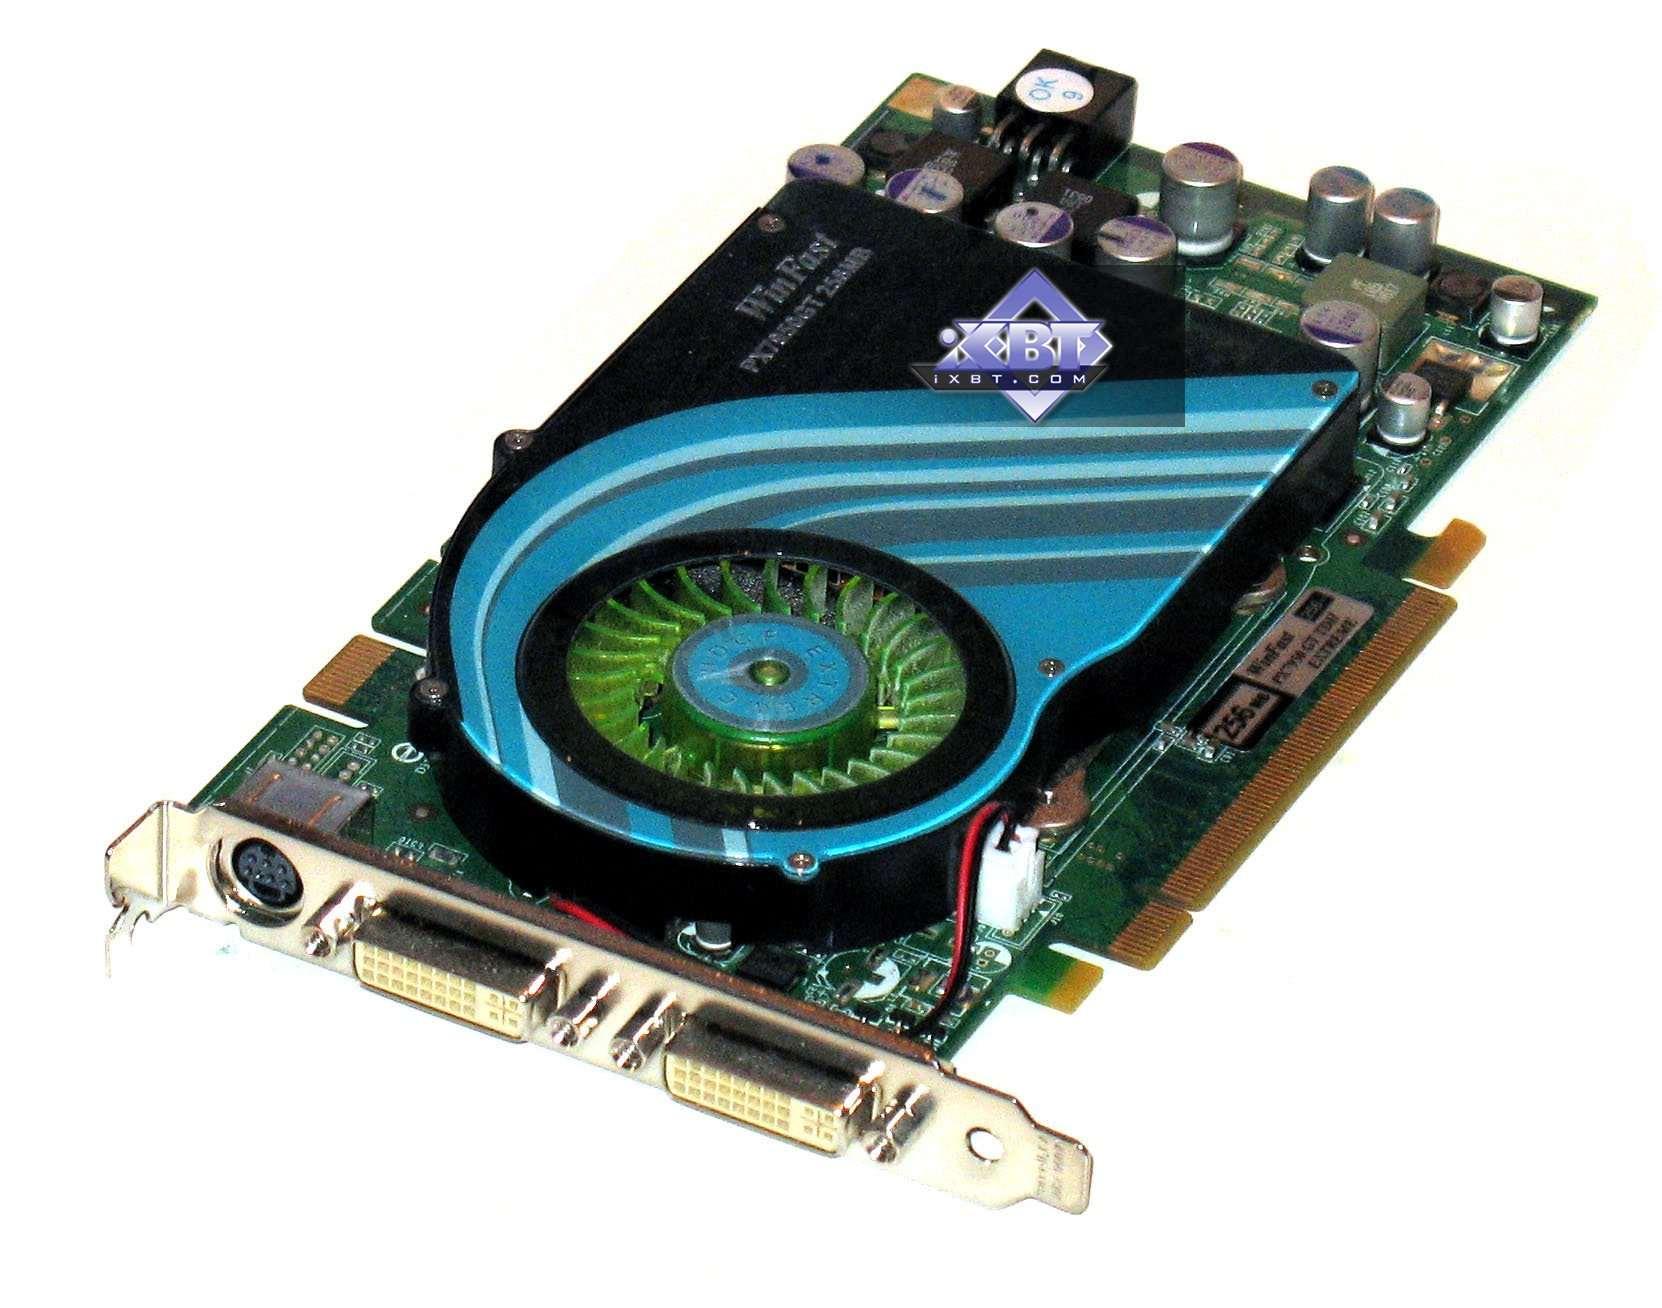 3Digest July 2007 NVIDIA GeForce 7950 GT PCI E 256MB DDR3 600 1430 MHz